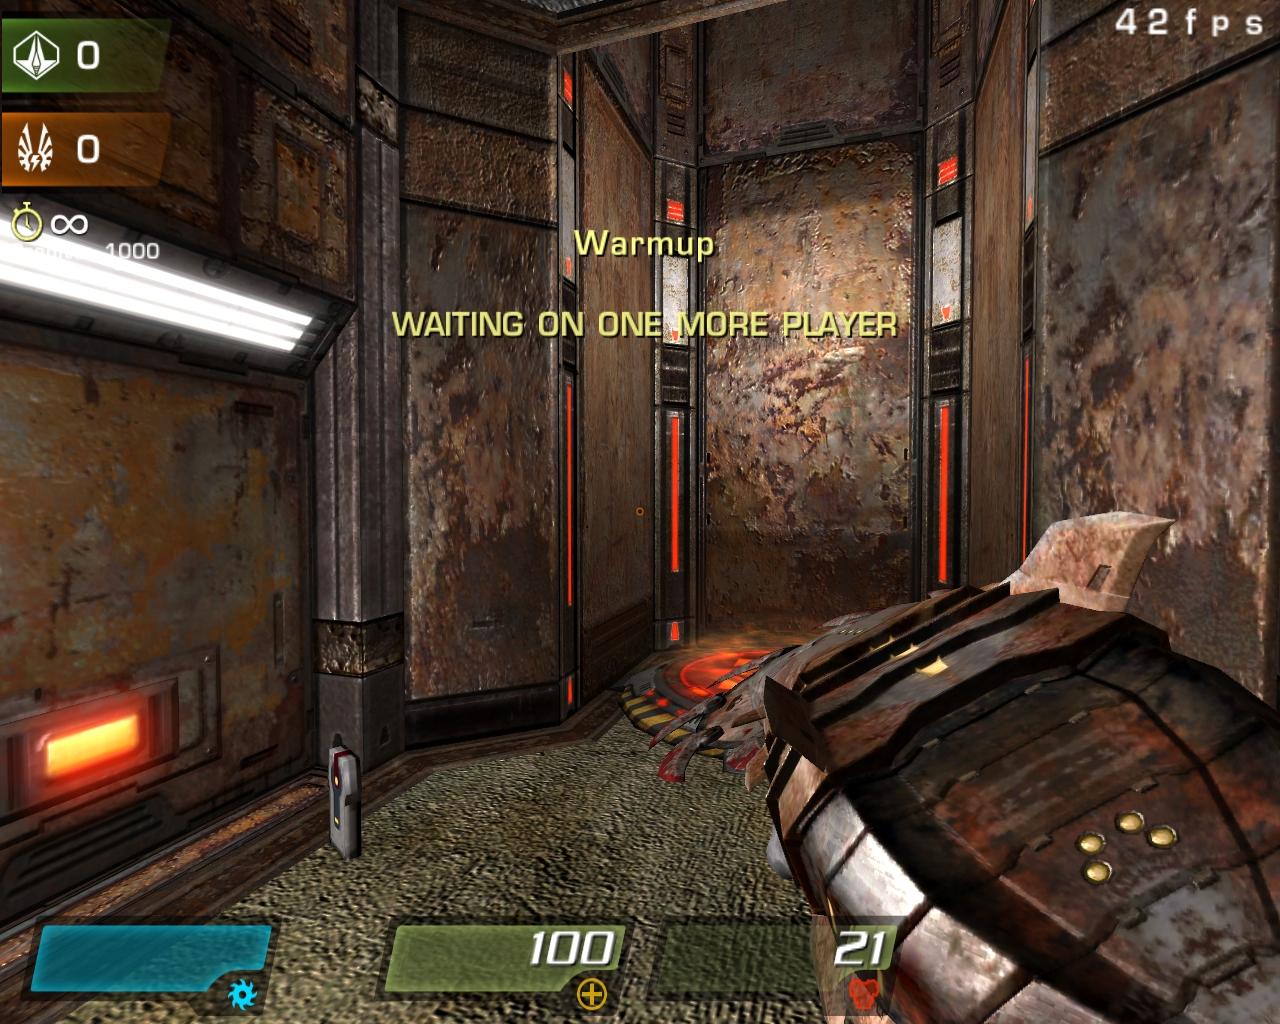 перчатка) - Quake 4